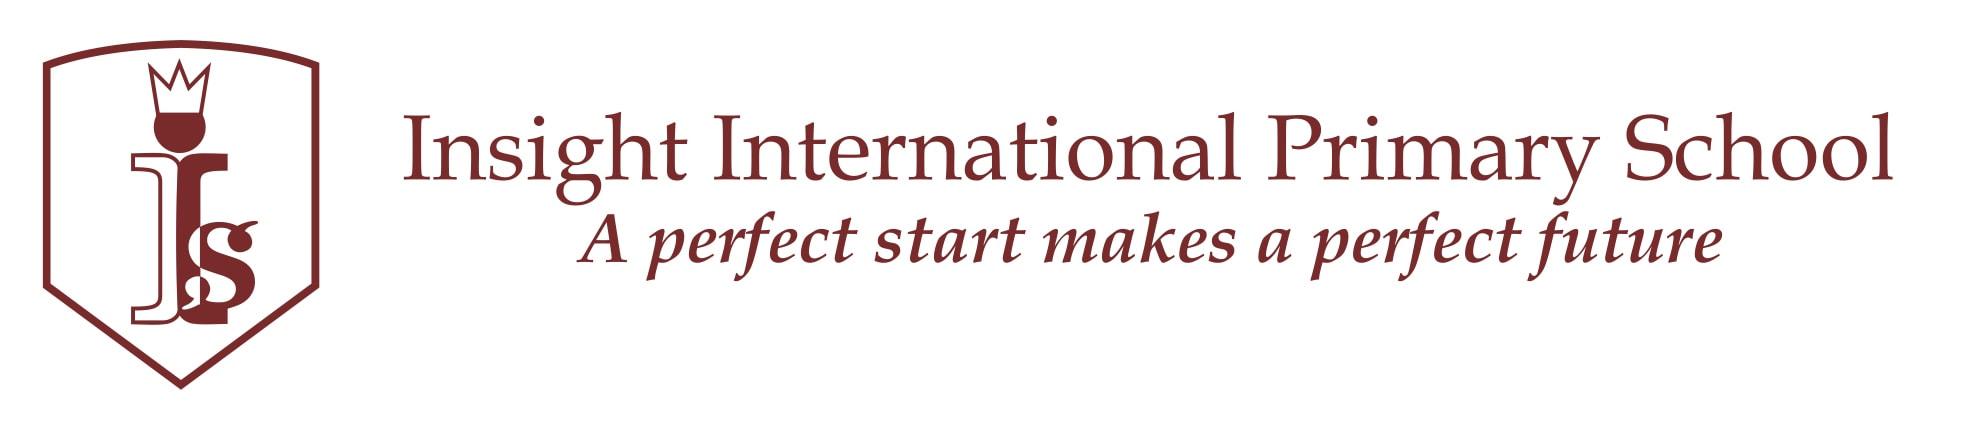 insight-international-primary-school_2_orig.jpg